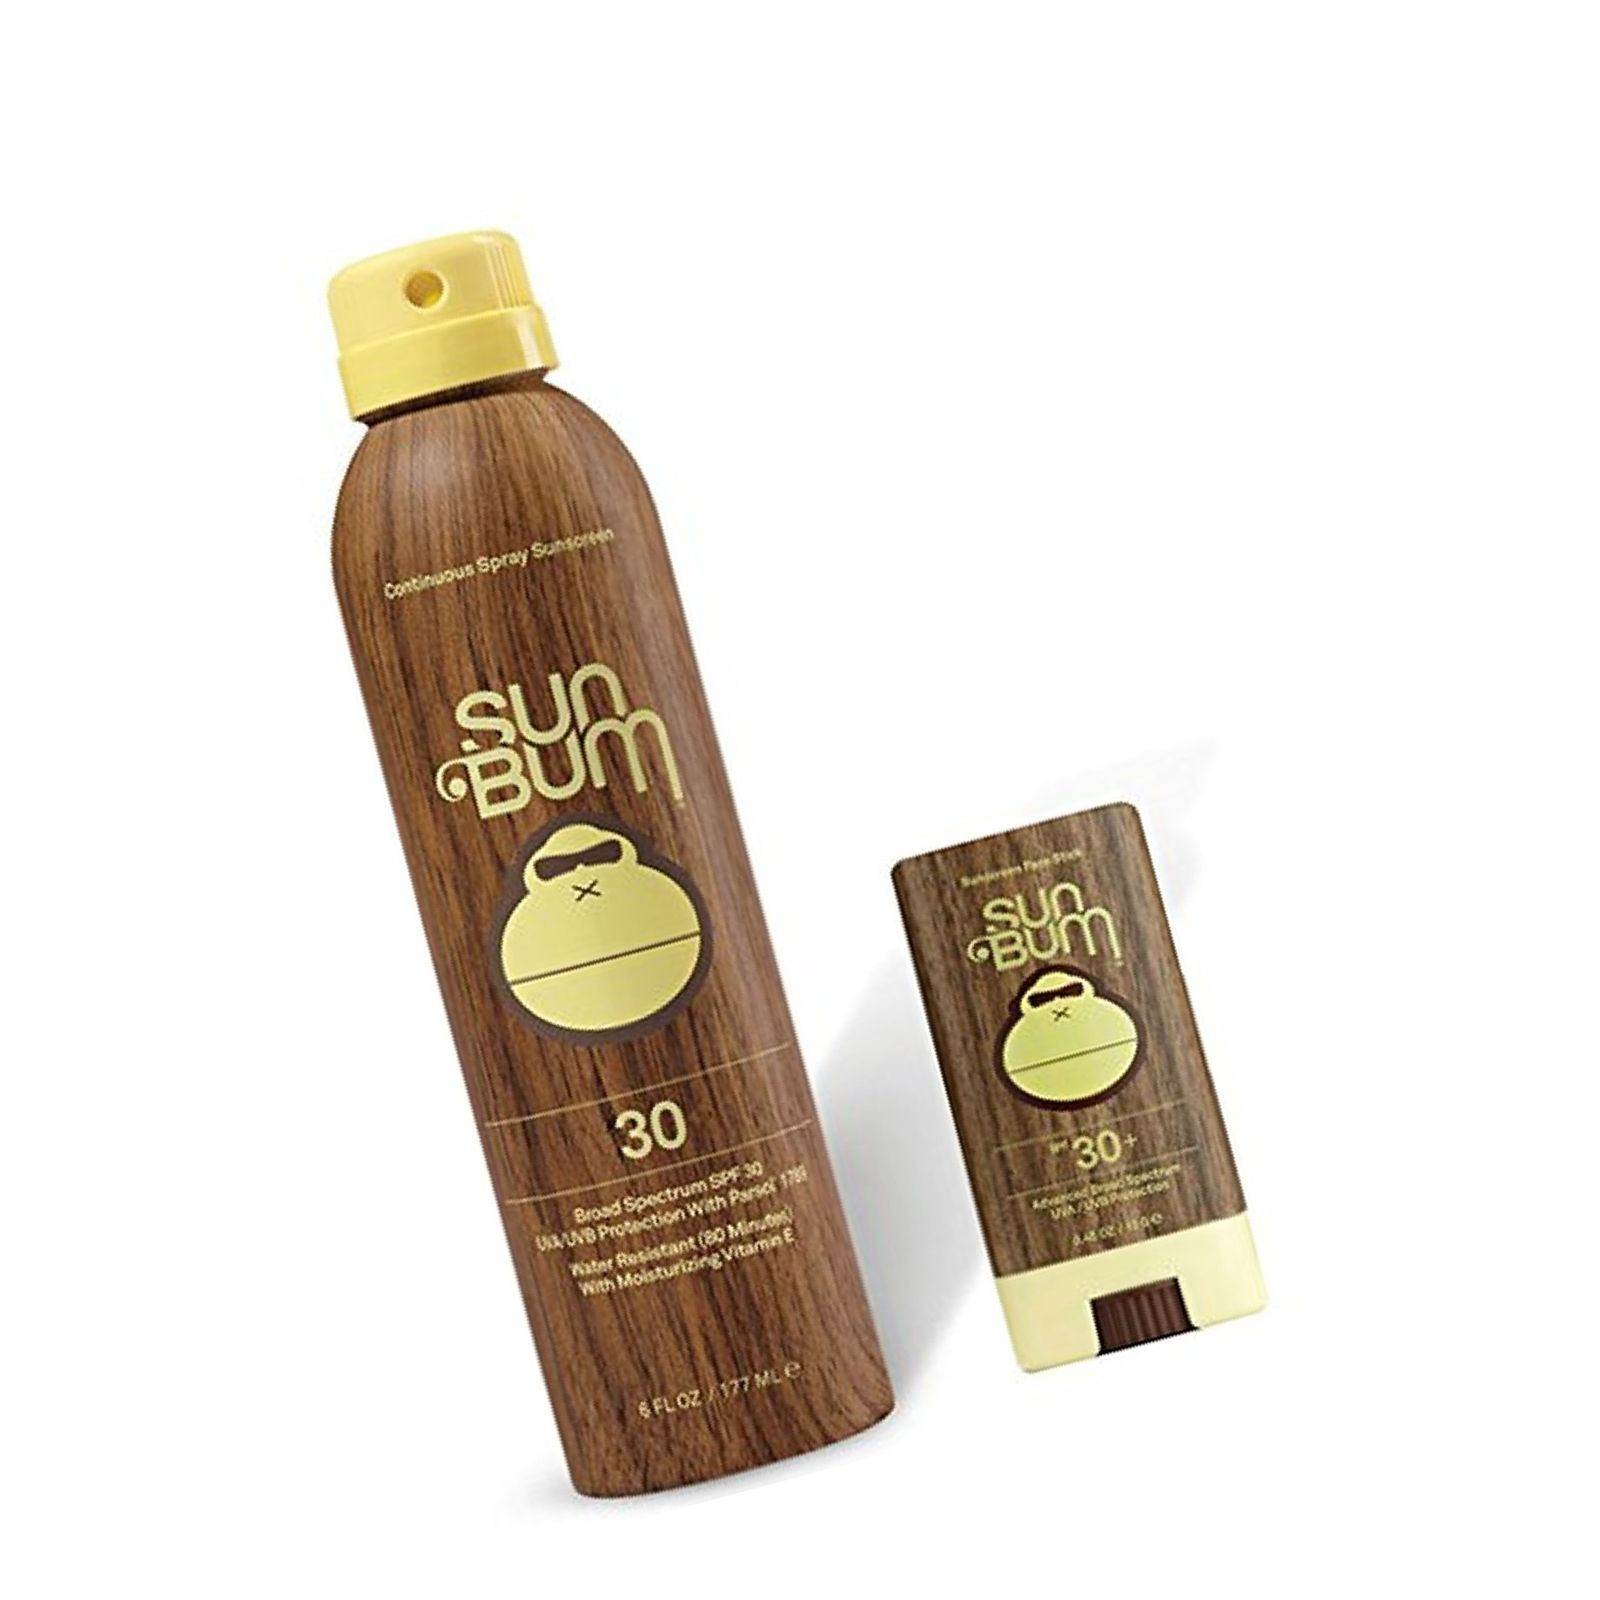 Sun Bum  | SPF Spray Sunscreen + Face Stick SPF 30 |  $19.85